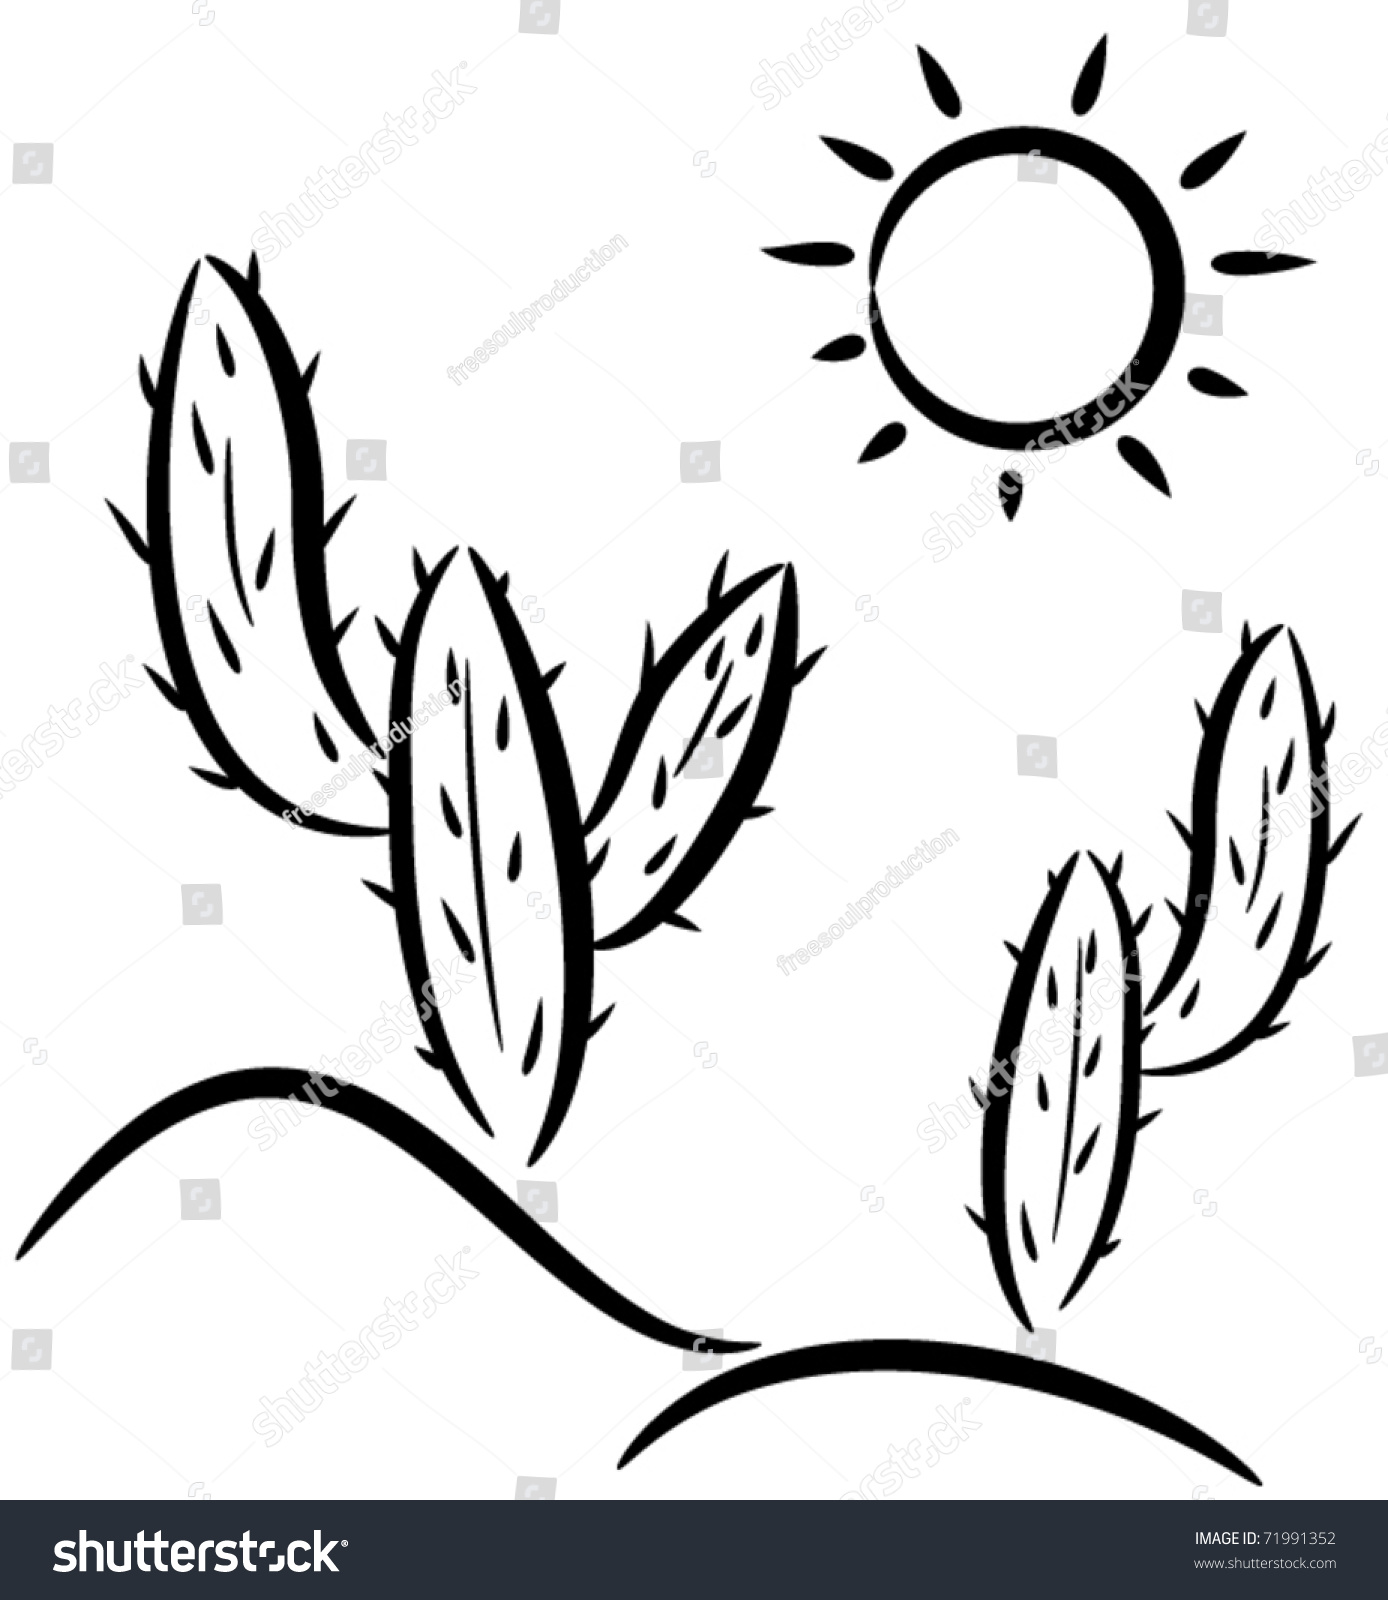 Clip Art Desert Clip Art vector cactus desert clipart stock 71991352 shutterstock in clip art